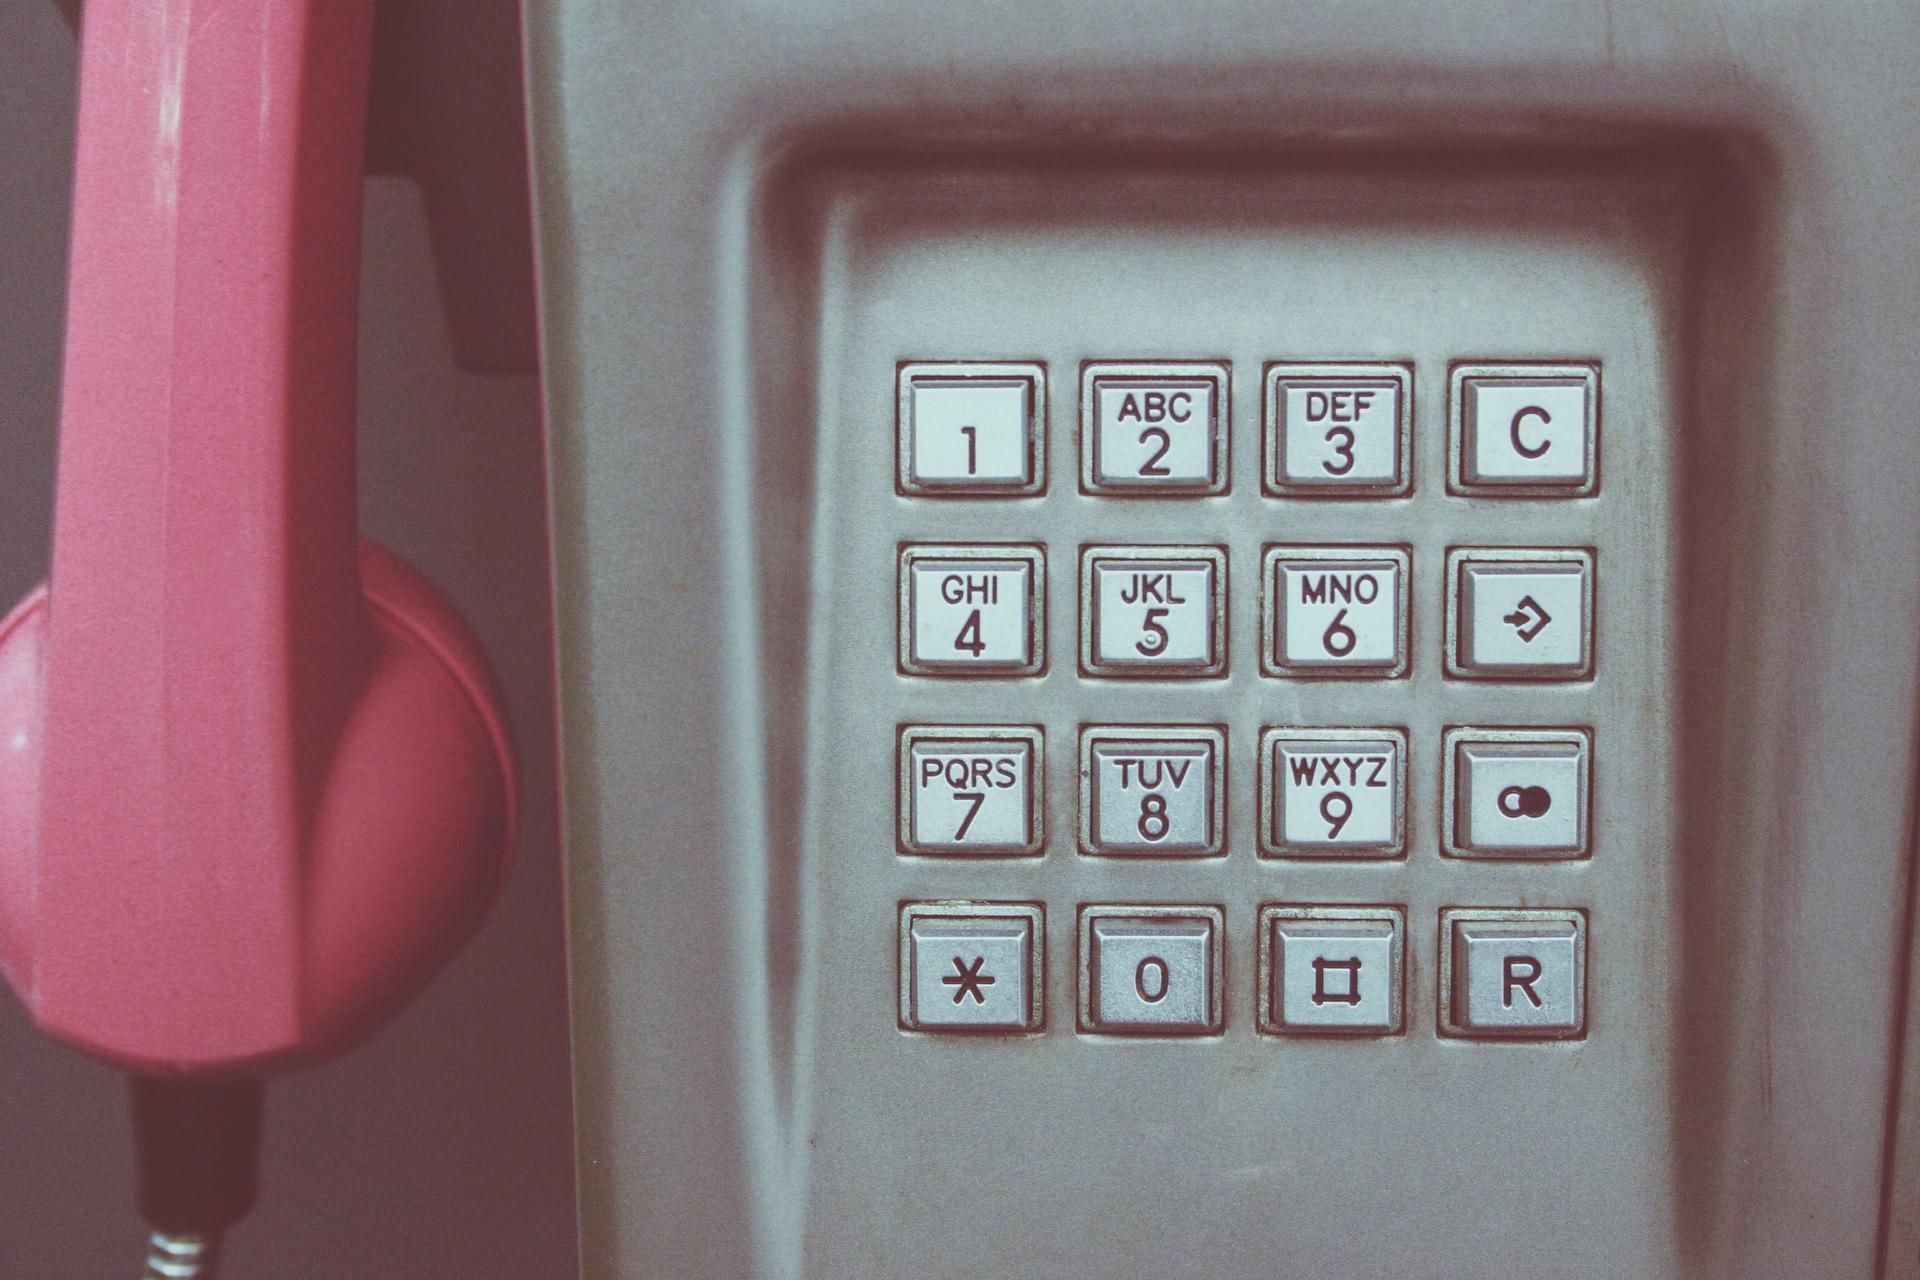 telefone, cabine, chaves, números, vintage, retrô, cabine telefônica - Papéis de parede HD - Professor-falken.com